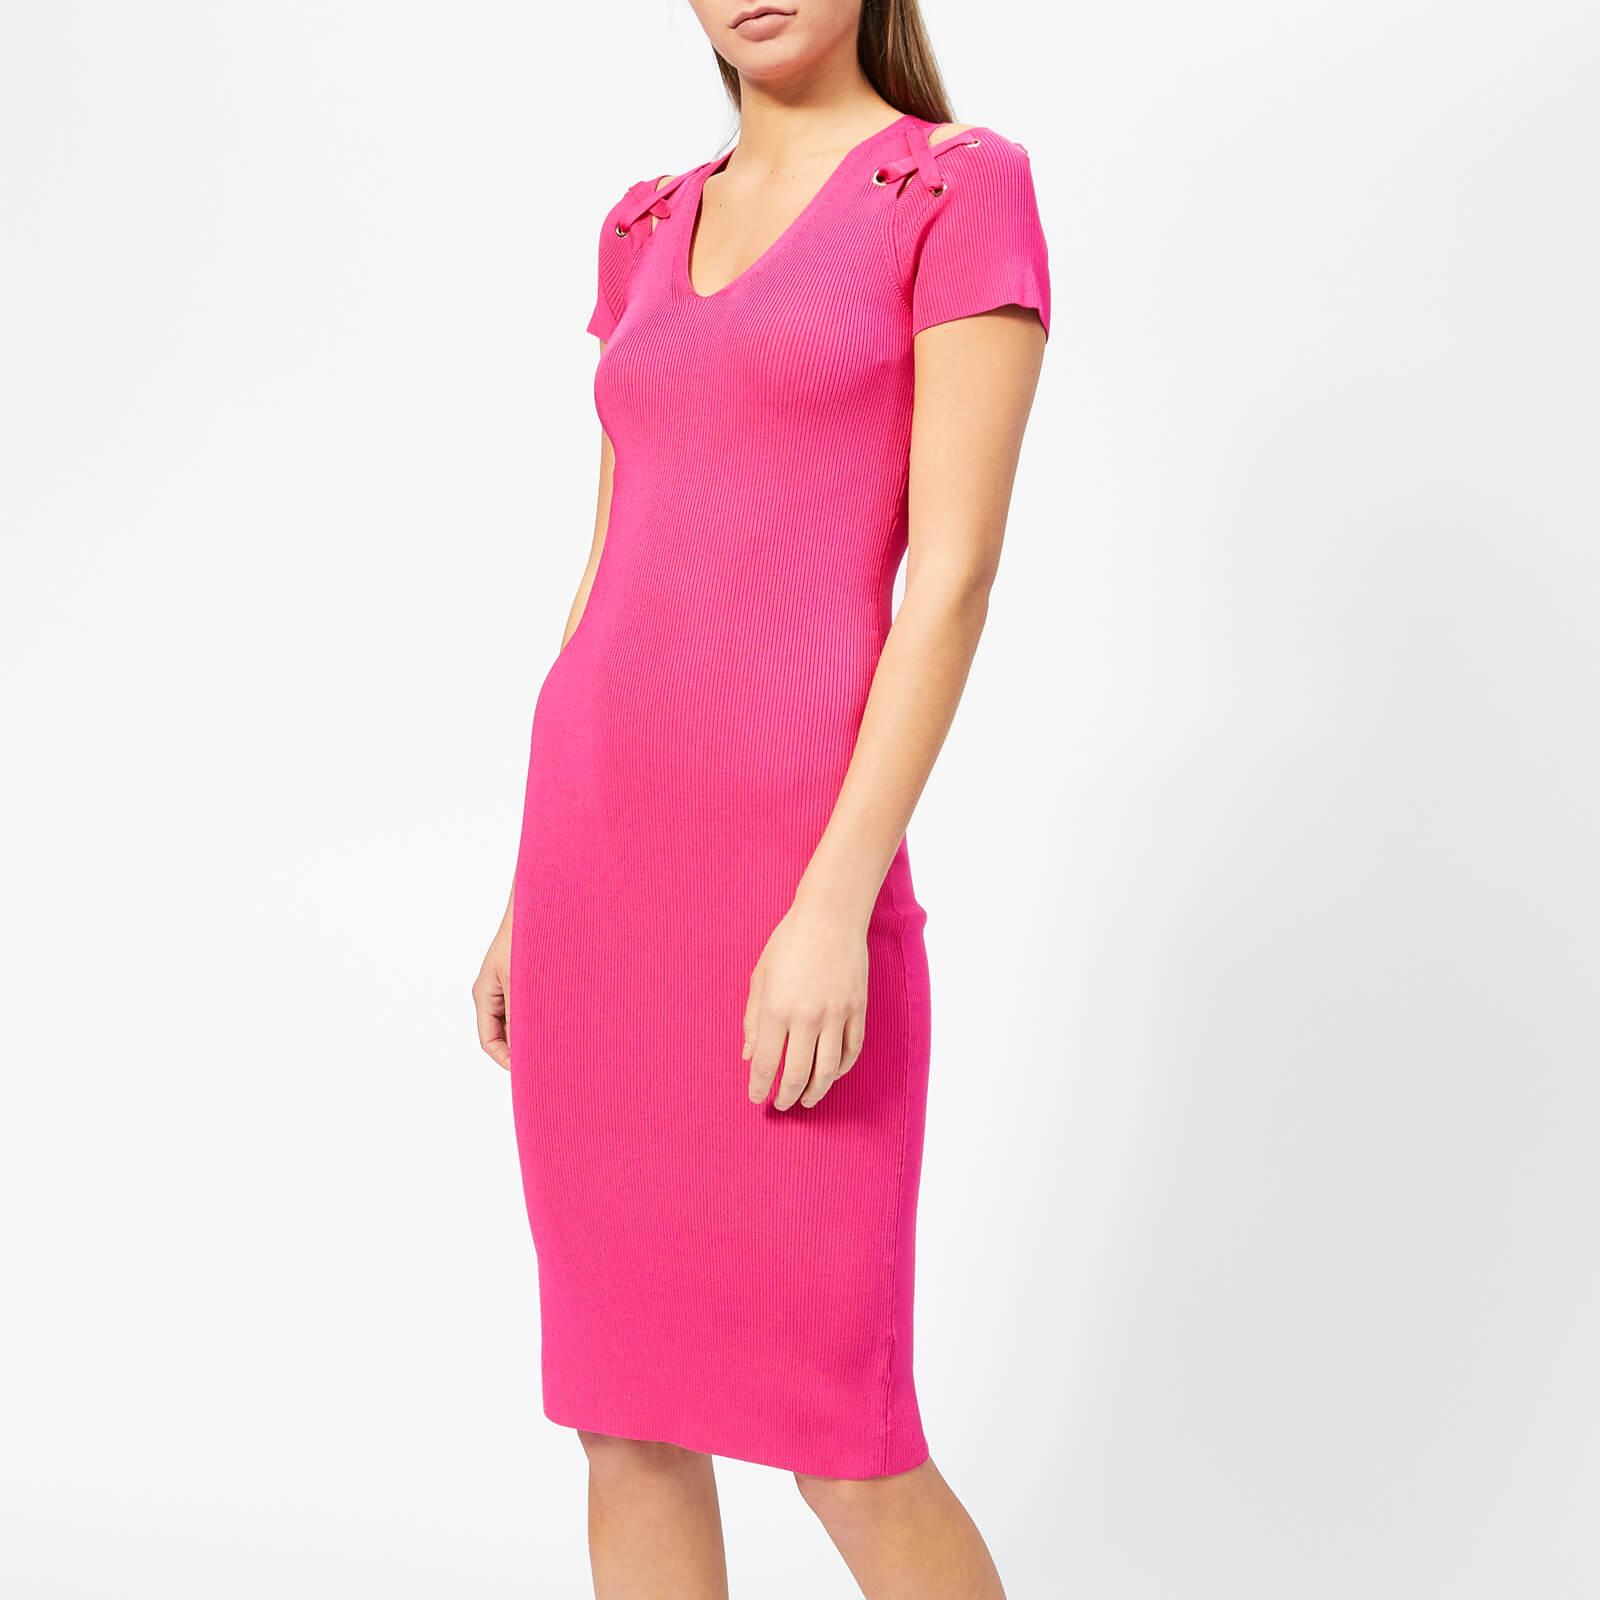 MICHAEL MICHAEL KORS Women's Cut Out Lace Up V Neck Dress - Electric Pink - XS - Pink